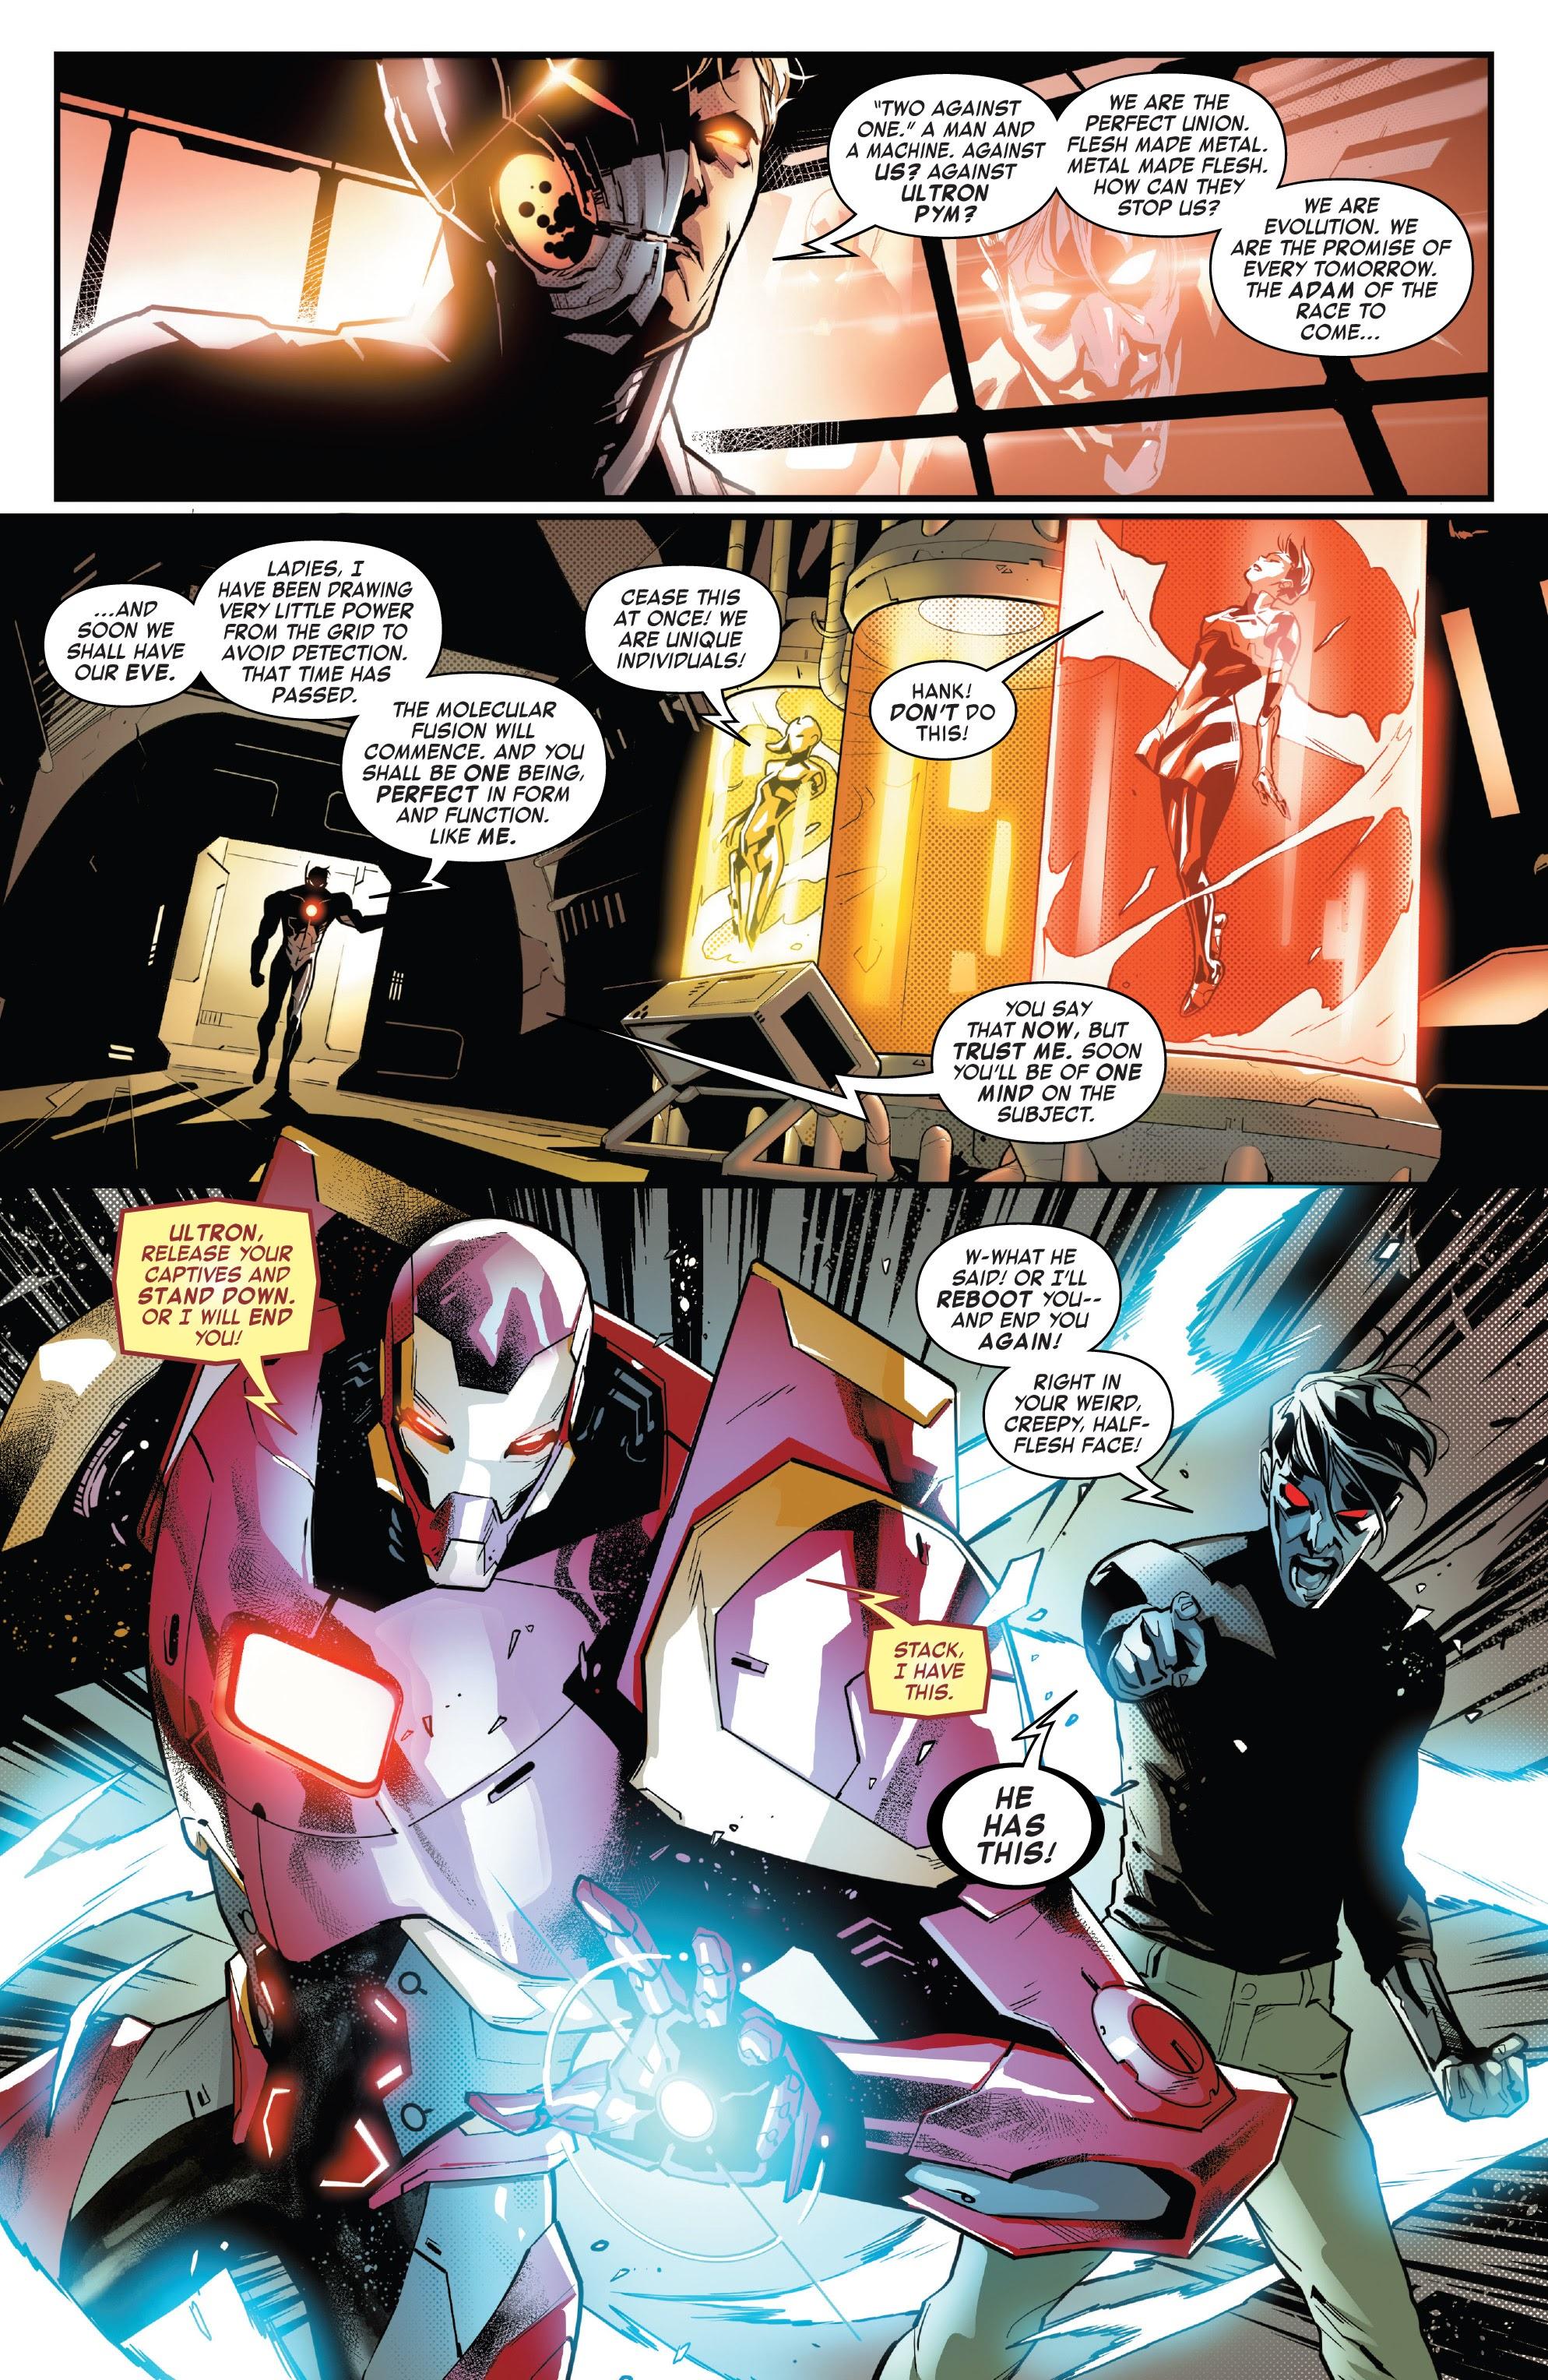 Read online Tony Stark: Iron Man comic -  Issue #16 - 15